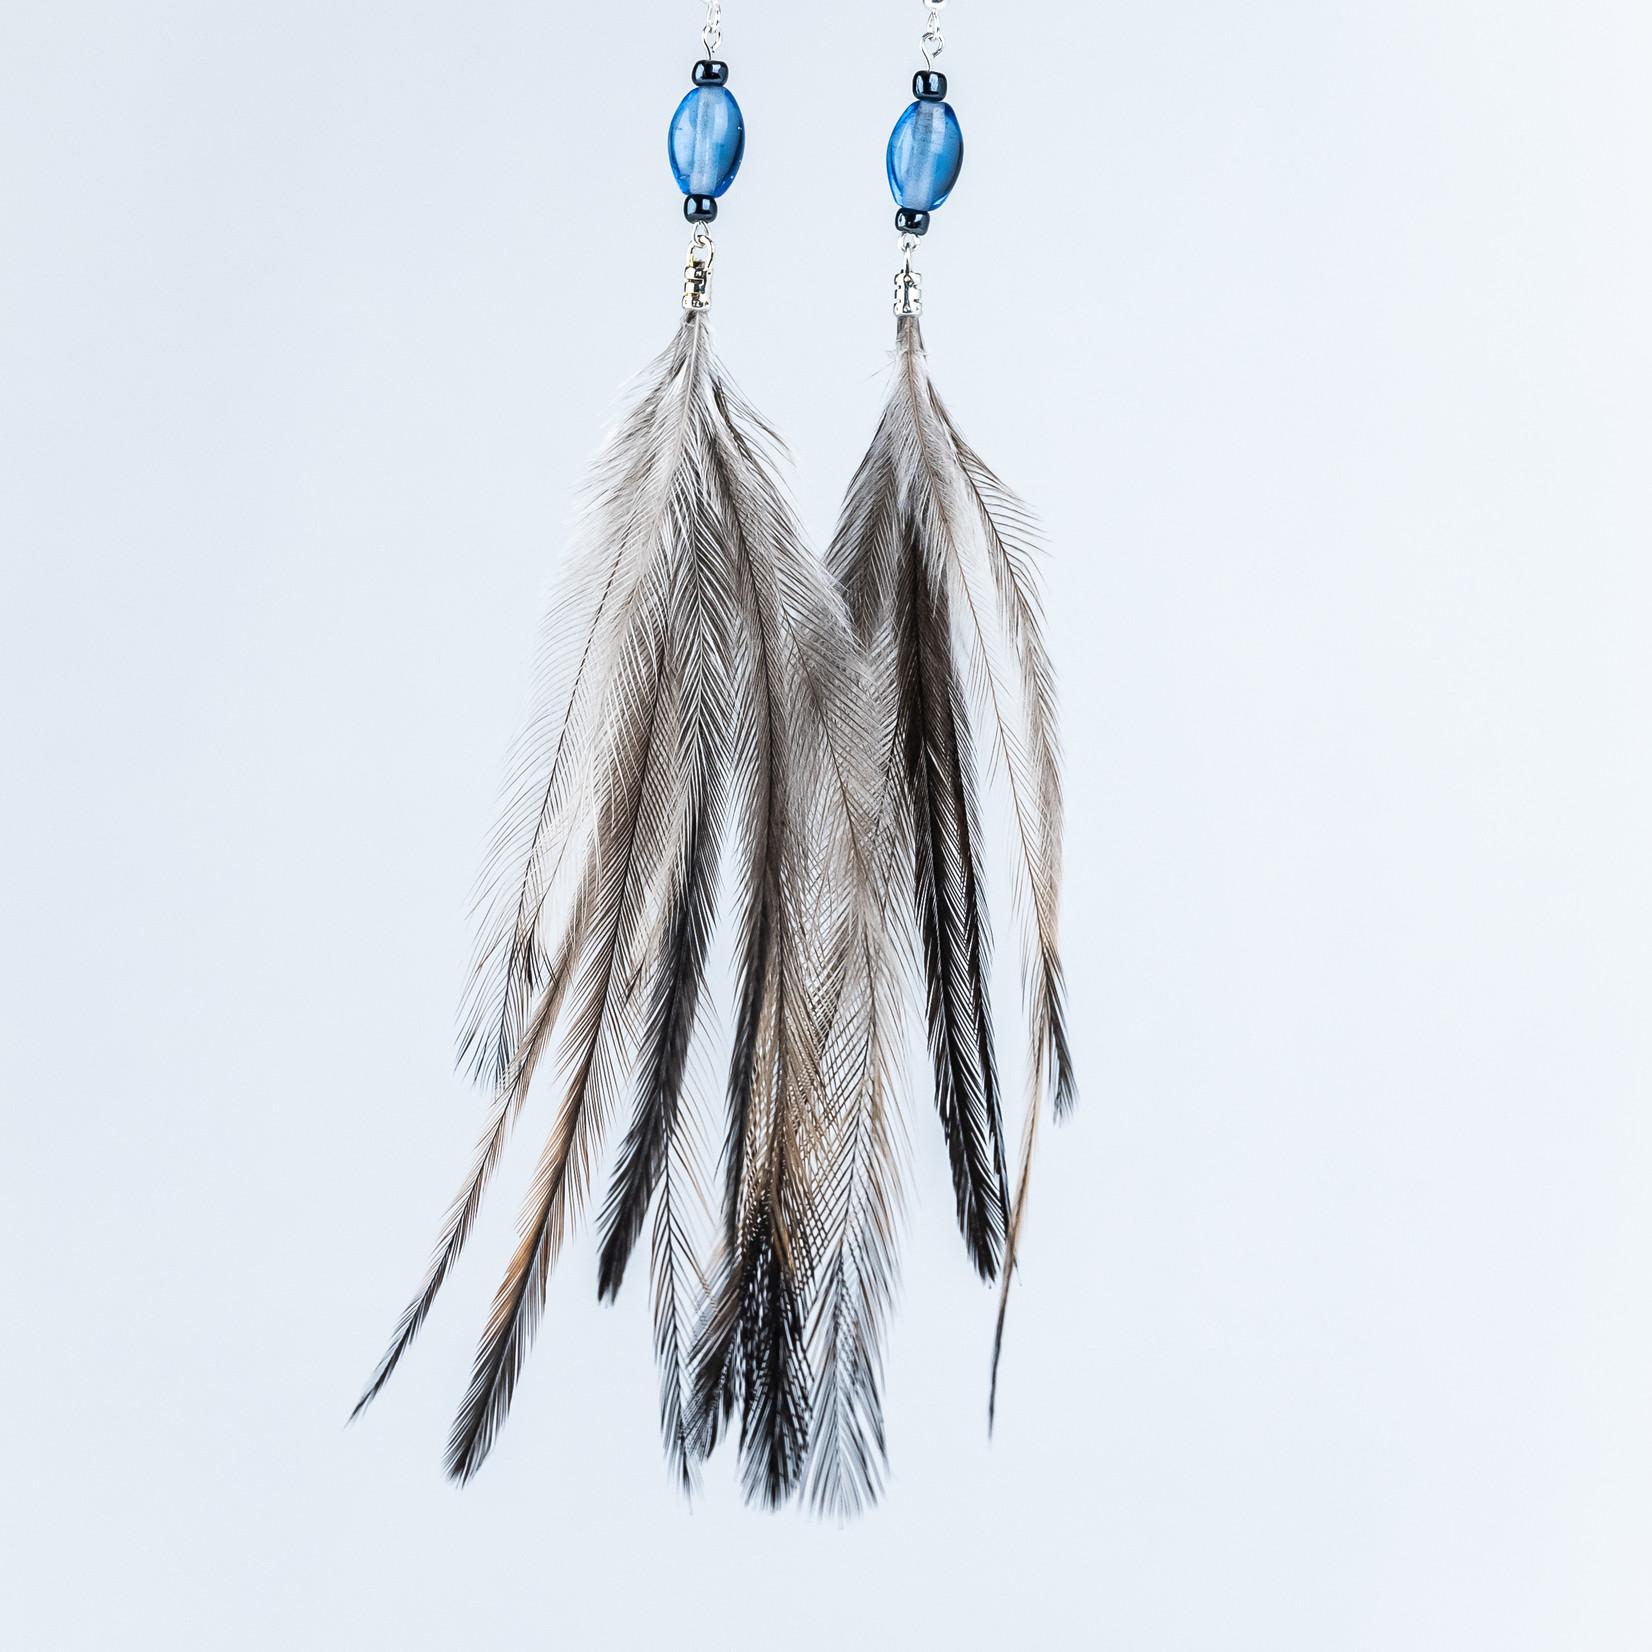 Marbeangrook Consulting Pty Ltd Emu Feather Earring - Marbeangrook